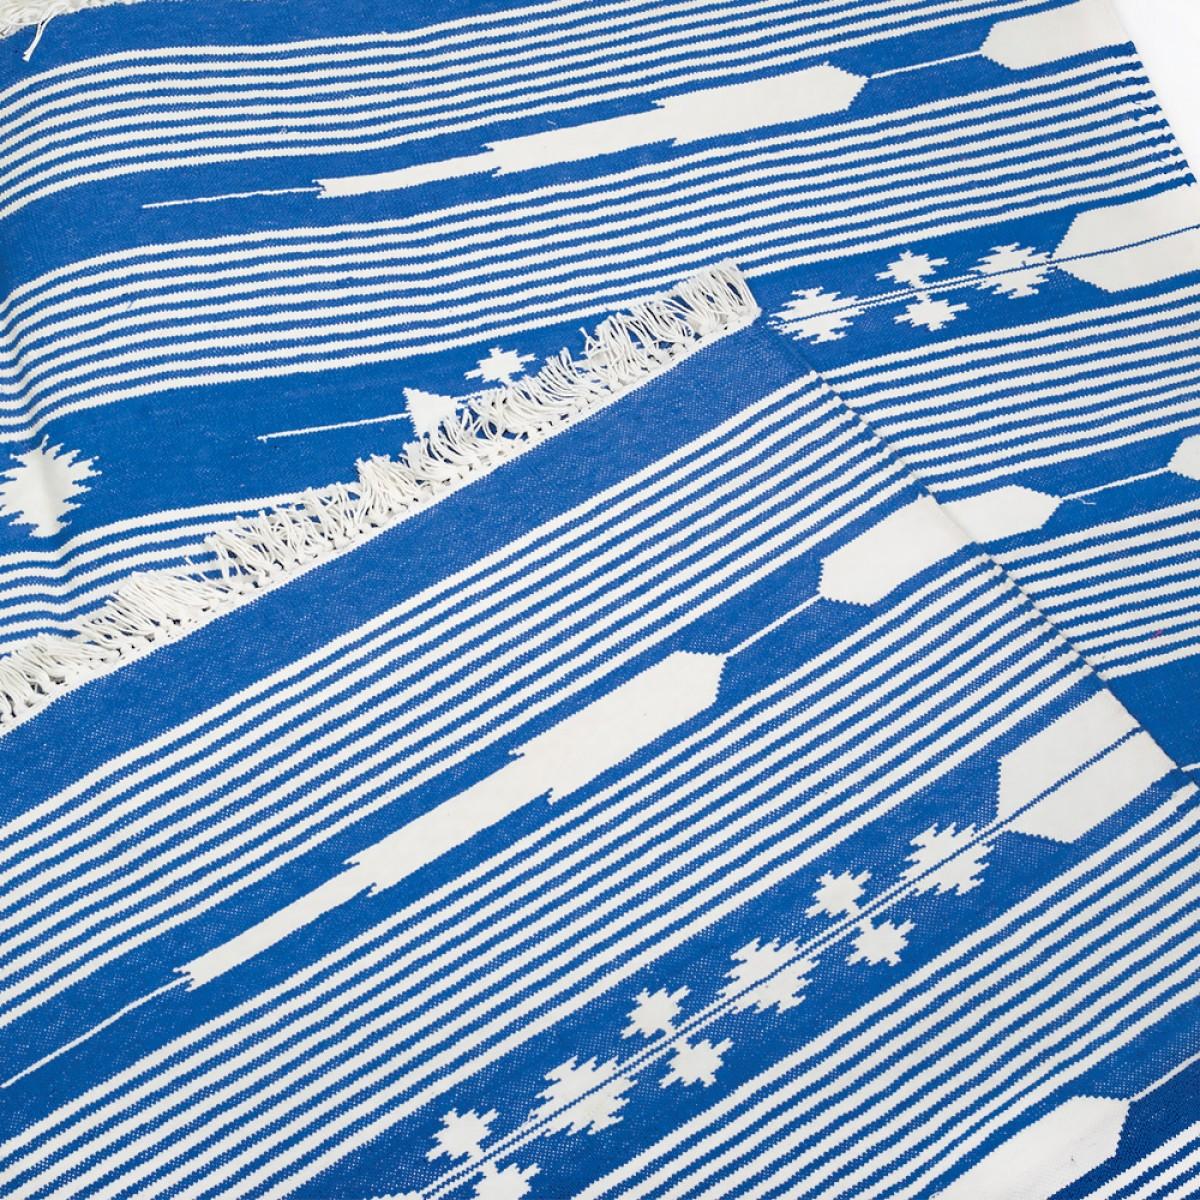 Cotton Floor Rugs - Blue & White